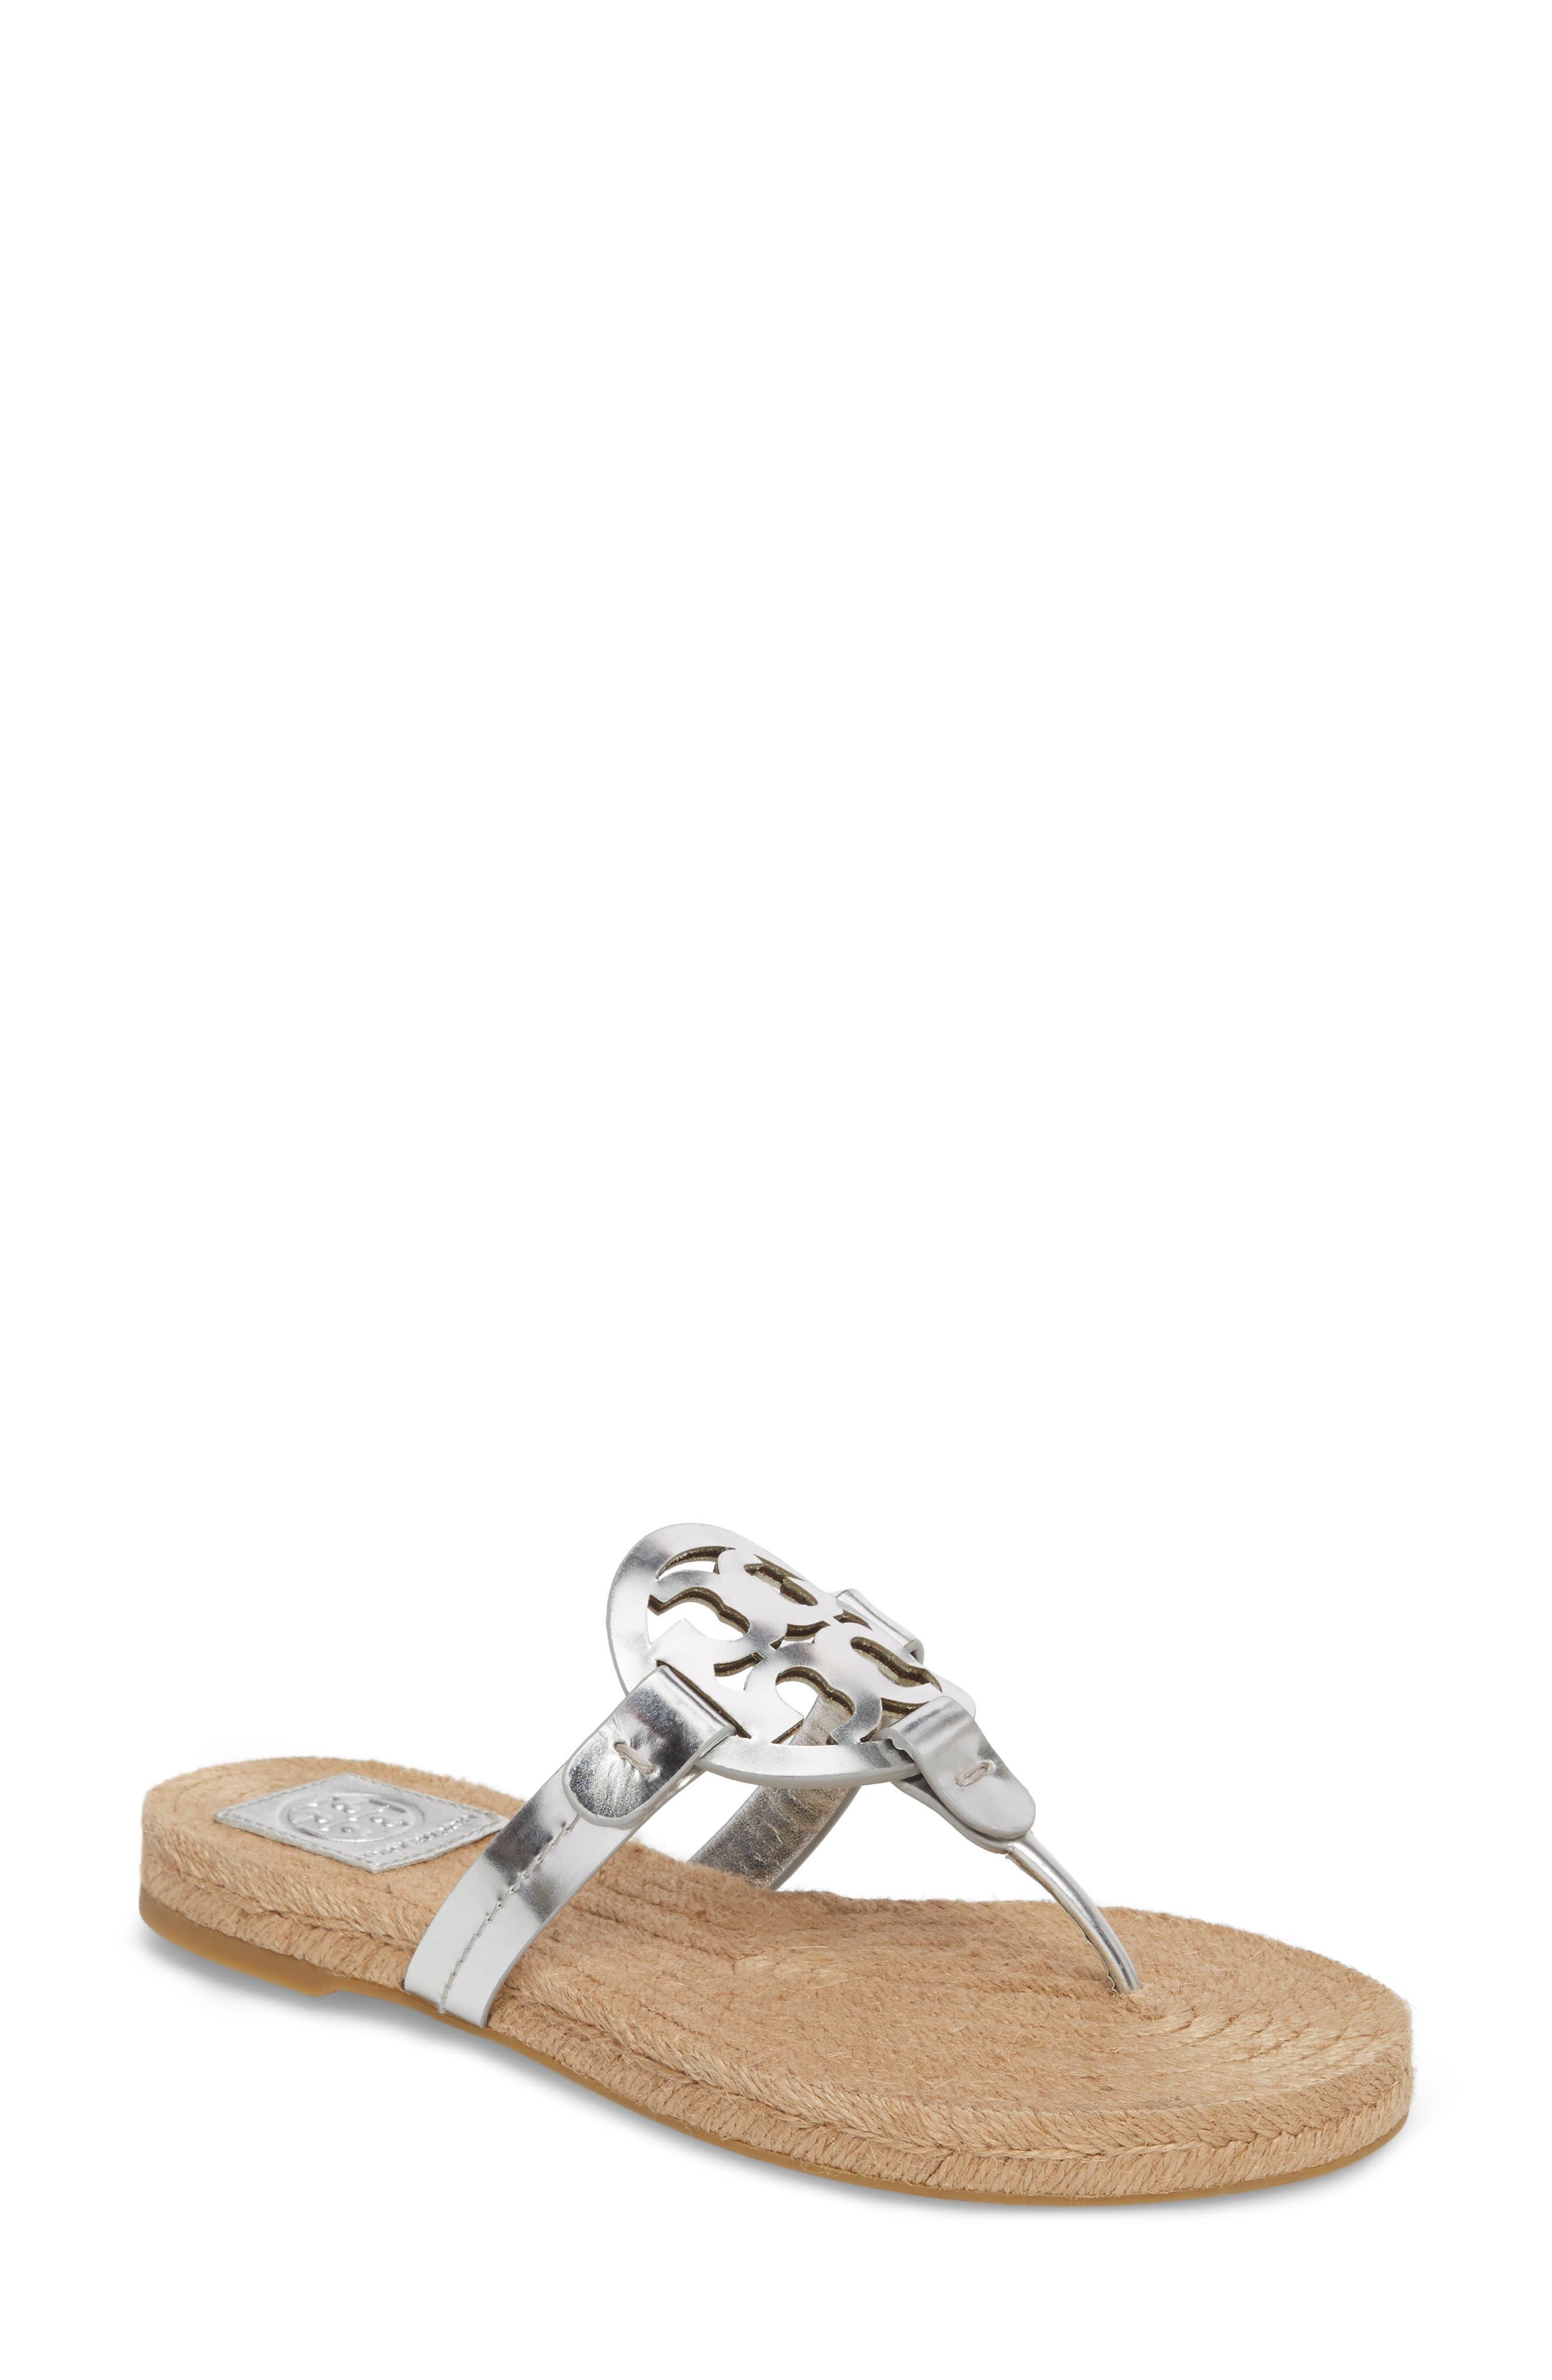 Miller Espadrille Sandal,                         Main,                         color, Silver/ Natural Vachetta